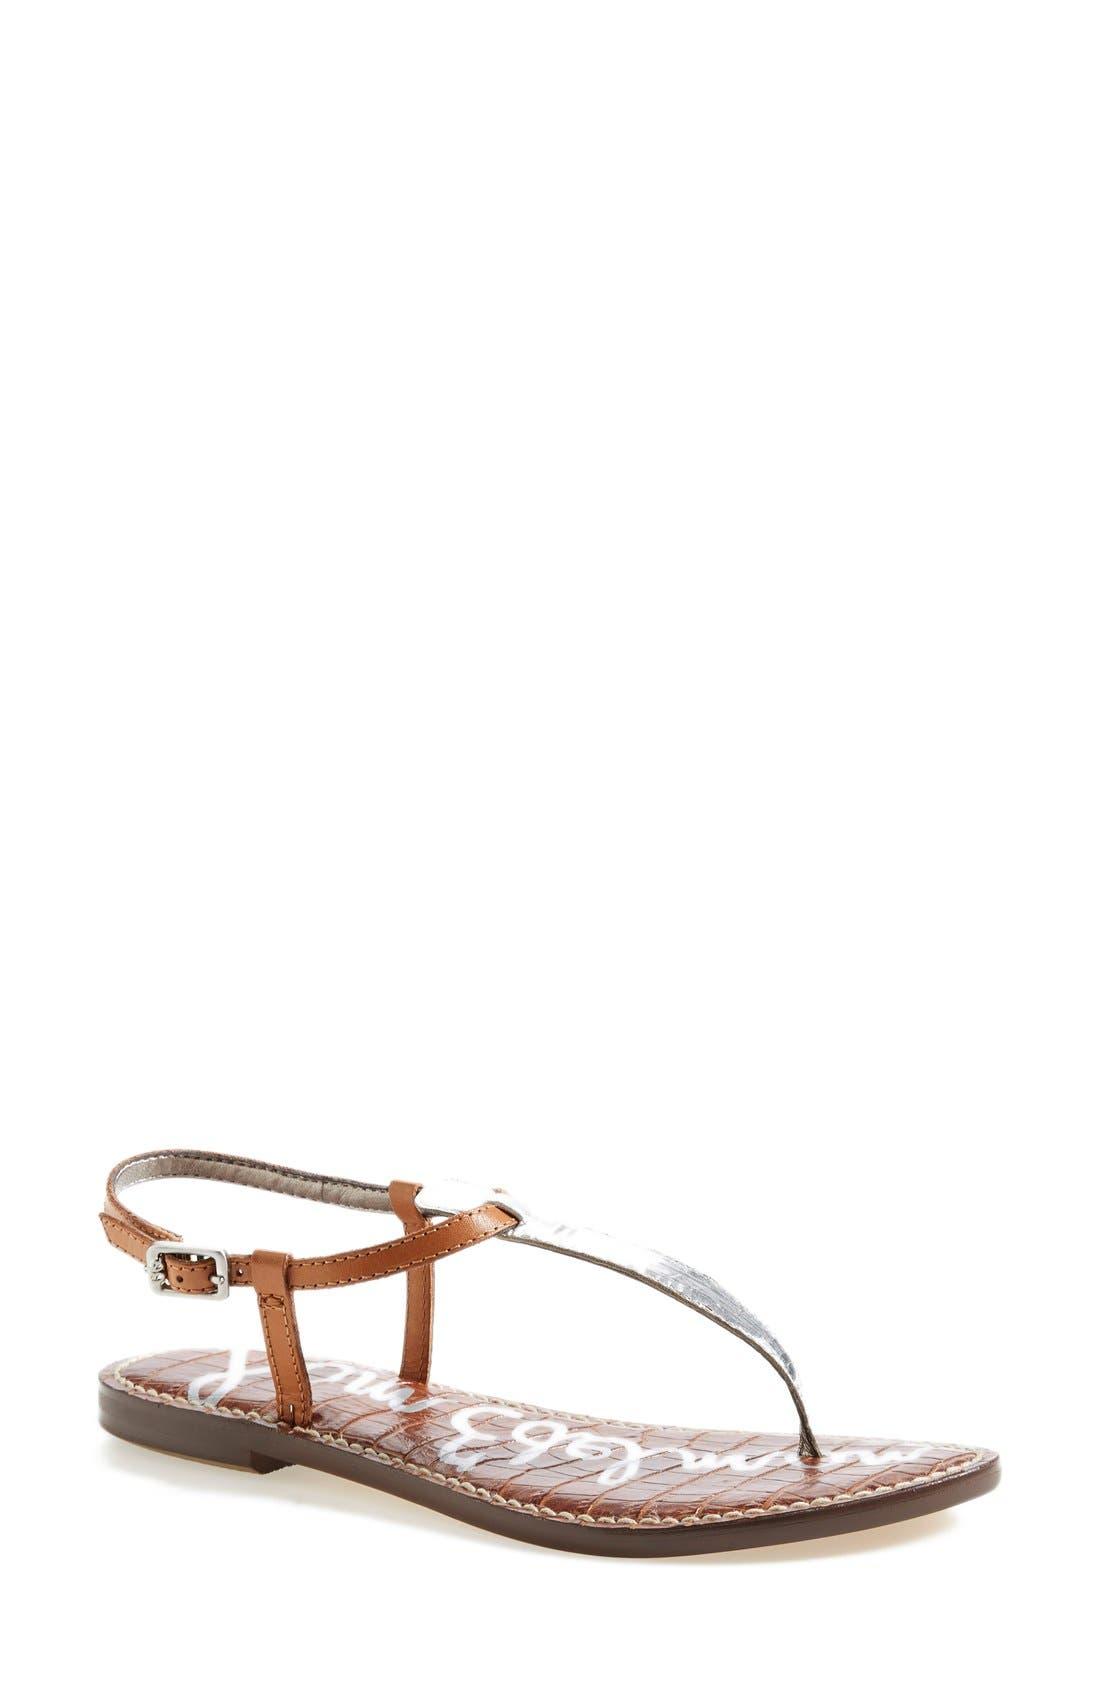 Main Image - Sam Edelman 'Gigi' Leather Sandal (Women)